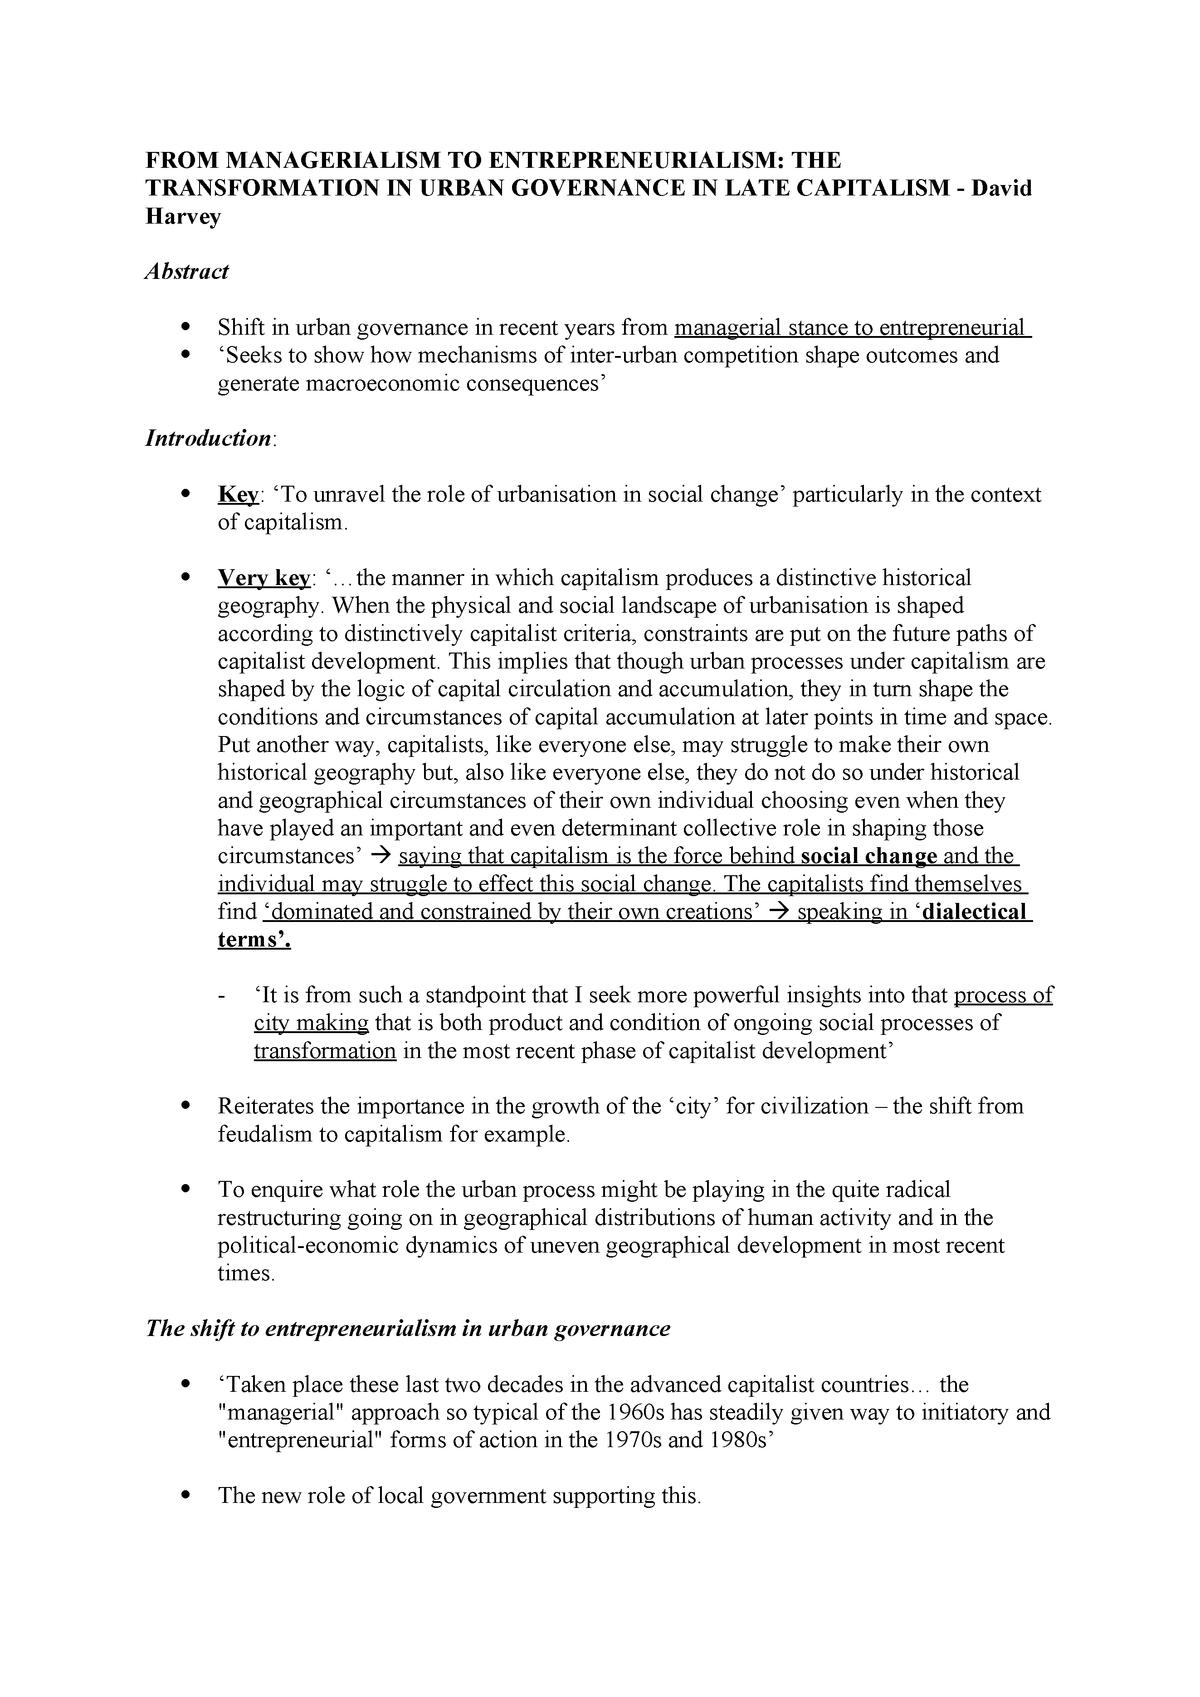 FROM Managerialism TO Entrepreneurialism - U20191 - StuDocu